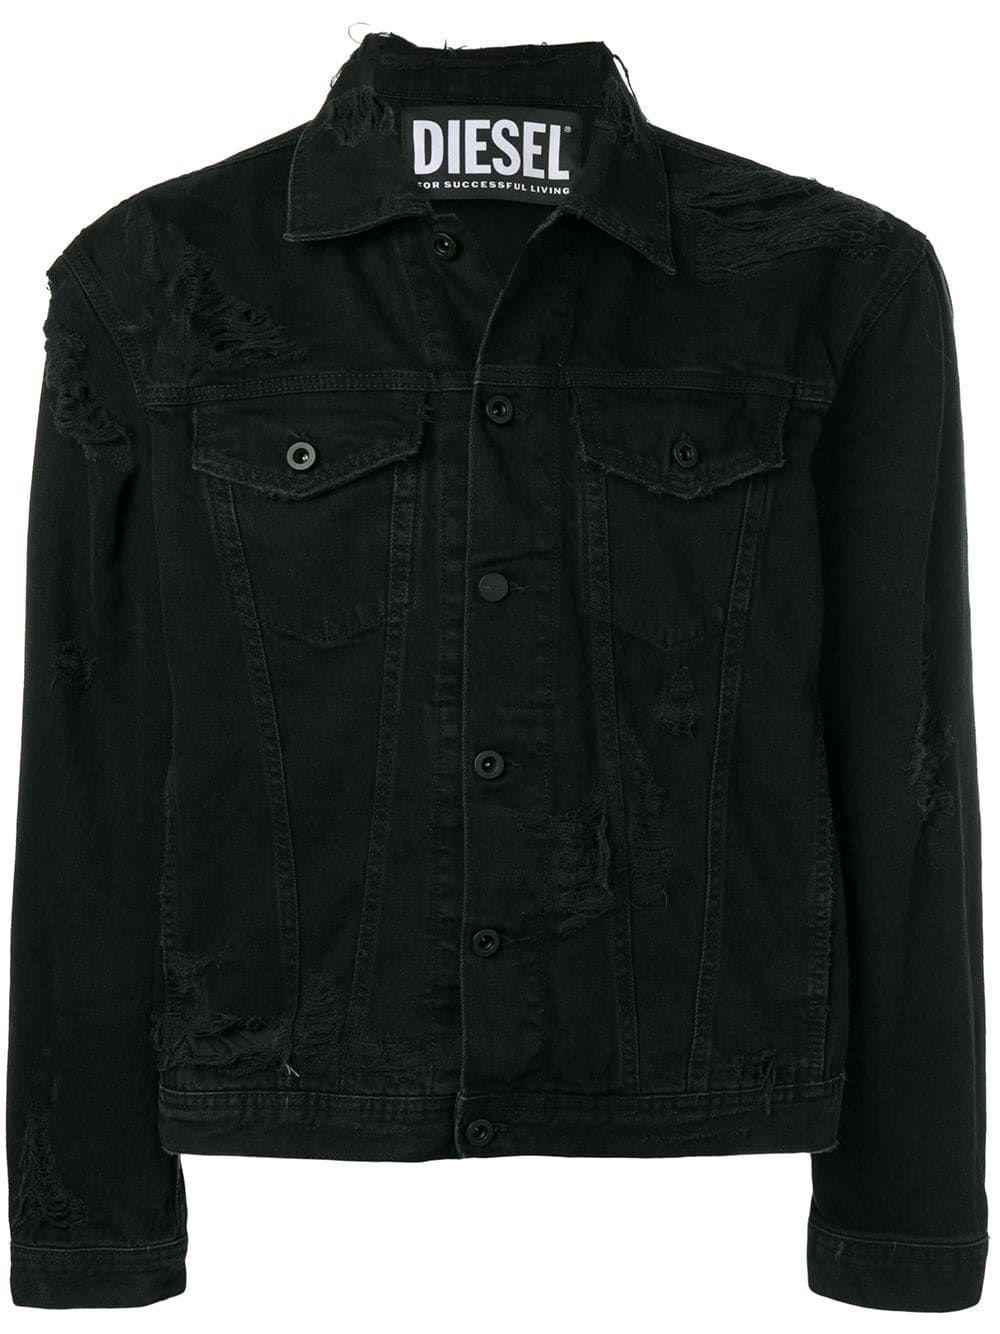 Diesel Distressed Denim Jacket Farfetch Distressed Denim Jacket Black Distressed Denim Jacket Jackets Men Fashion [ 1334 x 1000 Pixel ]